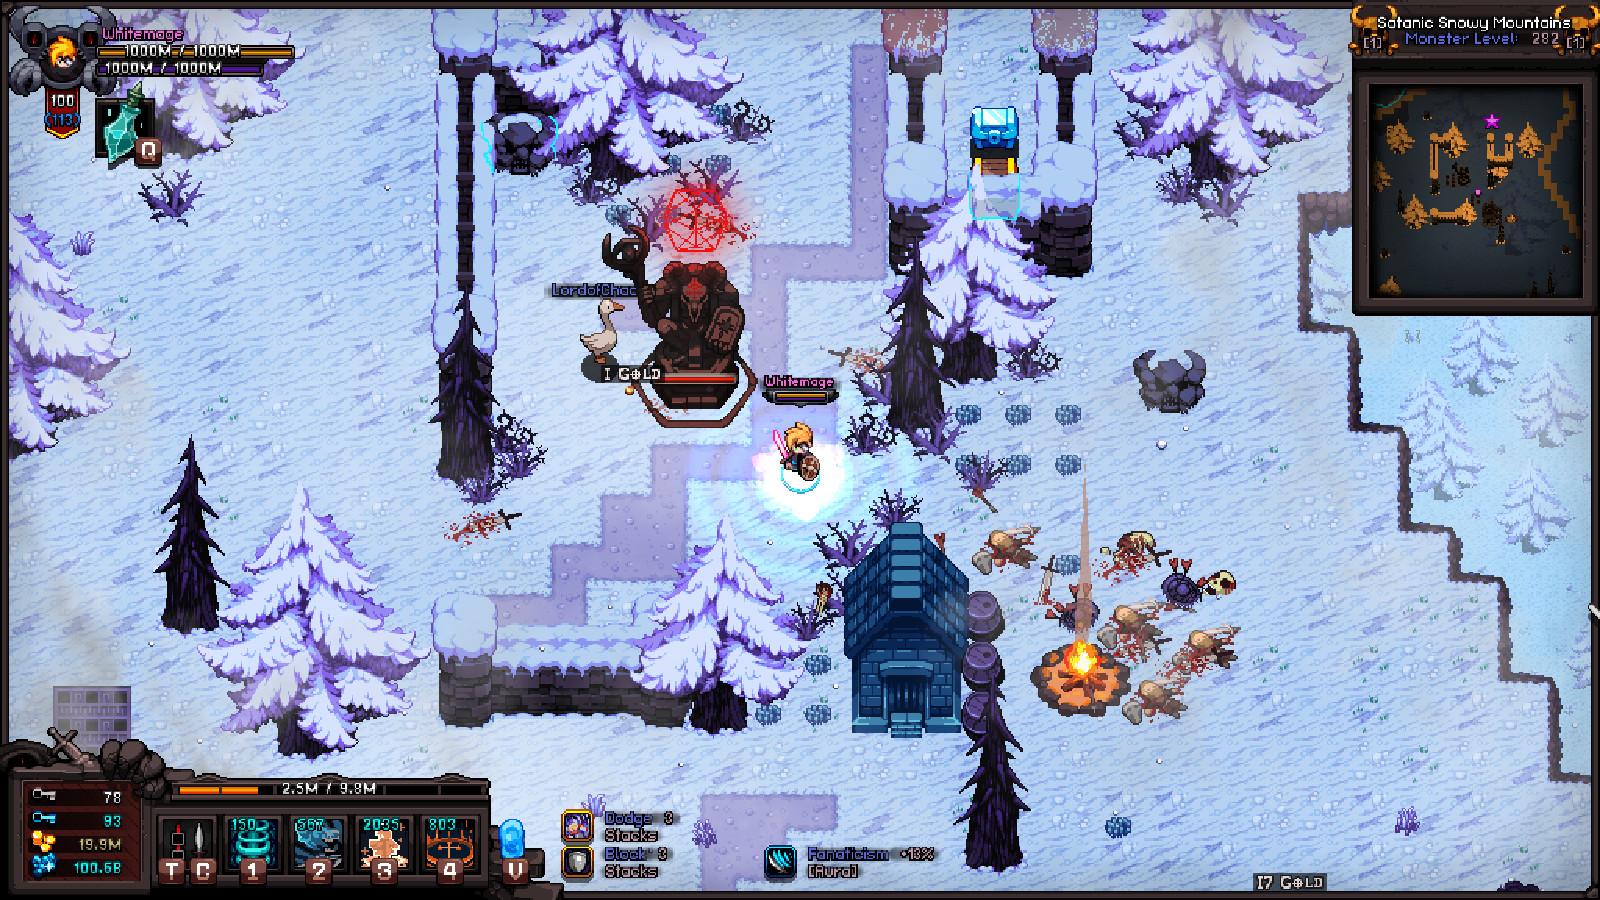 hero-siege-pc-screenshot-1